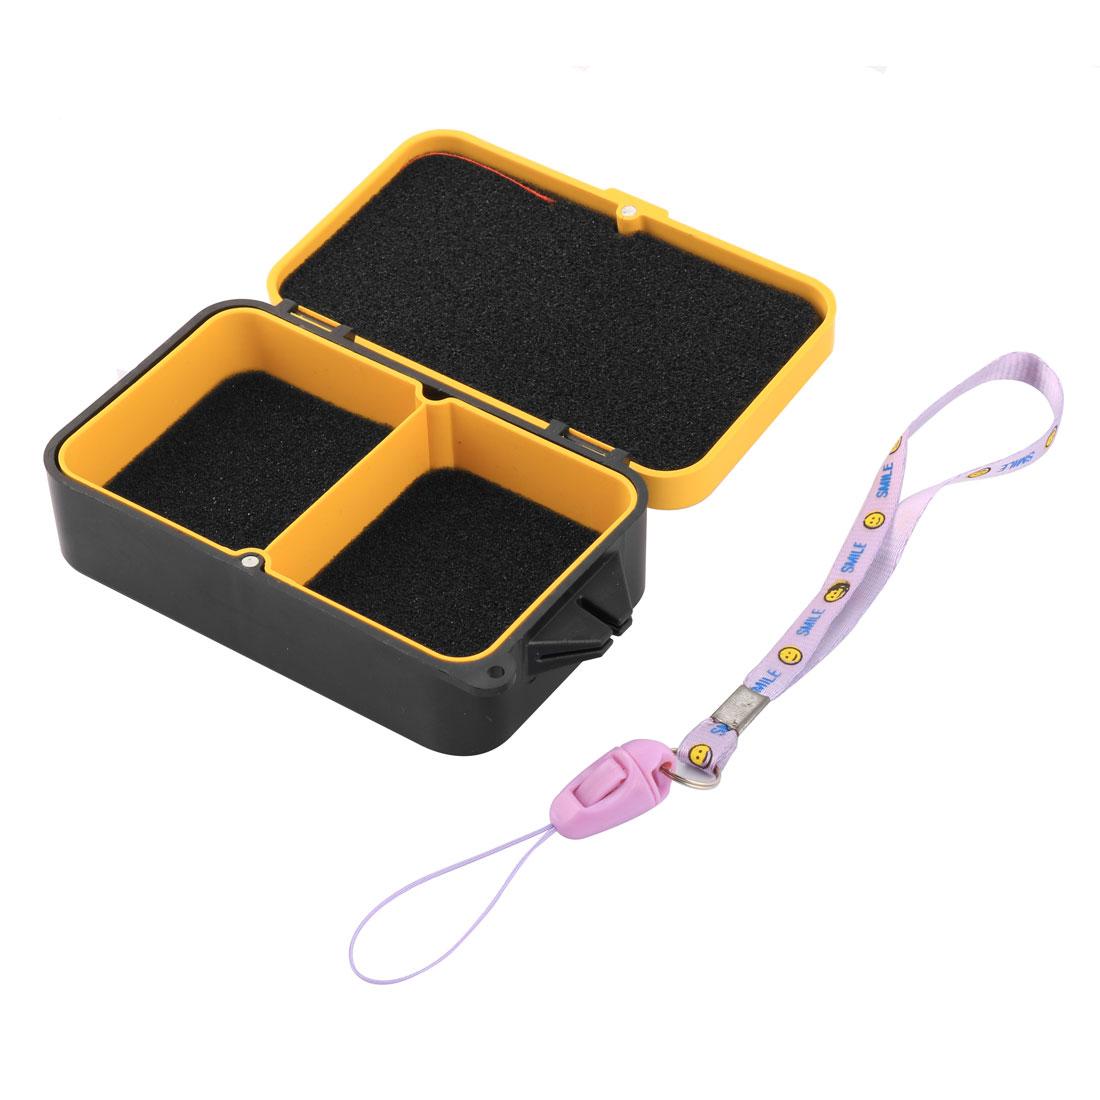 Outdoor Travel Fishing Lure Bait Case Storage Box Orange Black